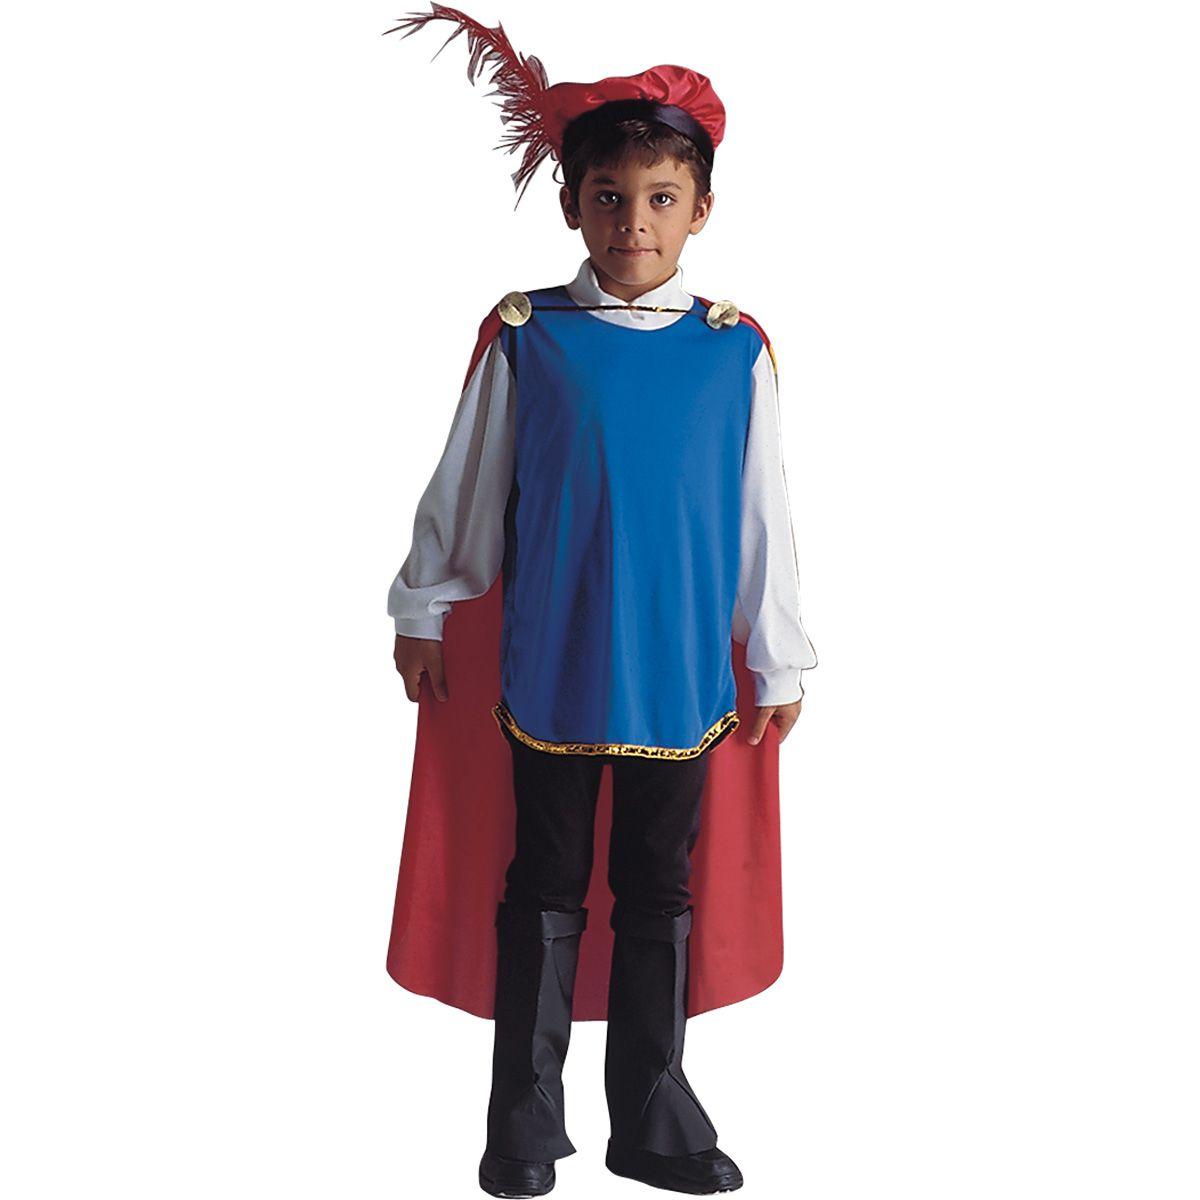 Fantasia Principe Infantil